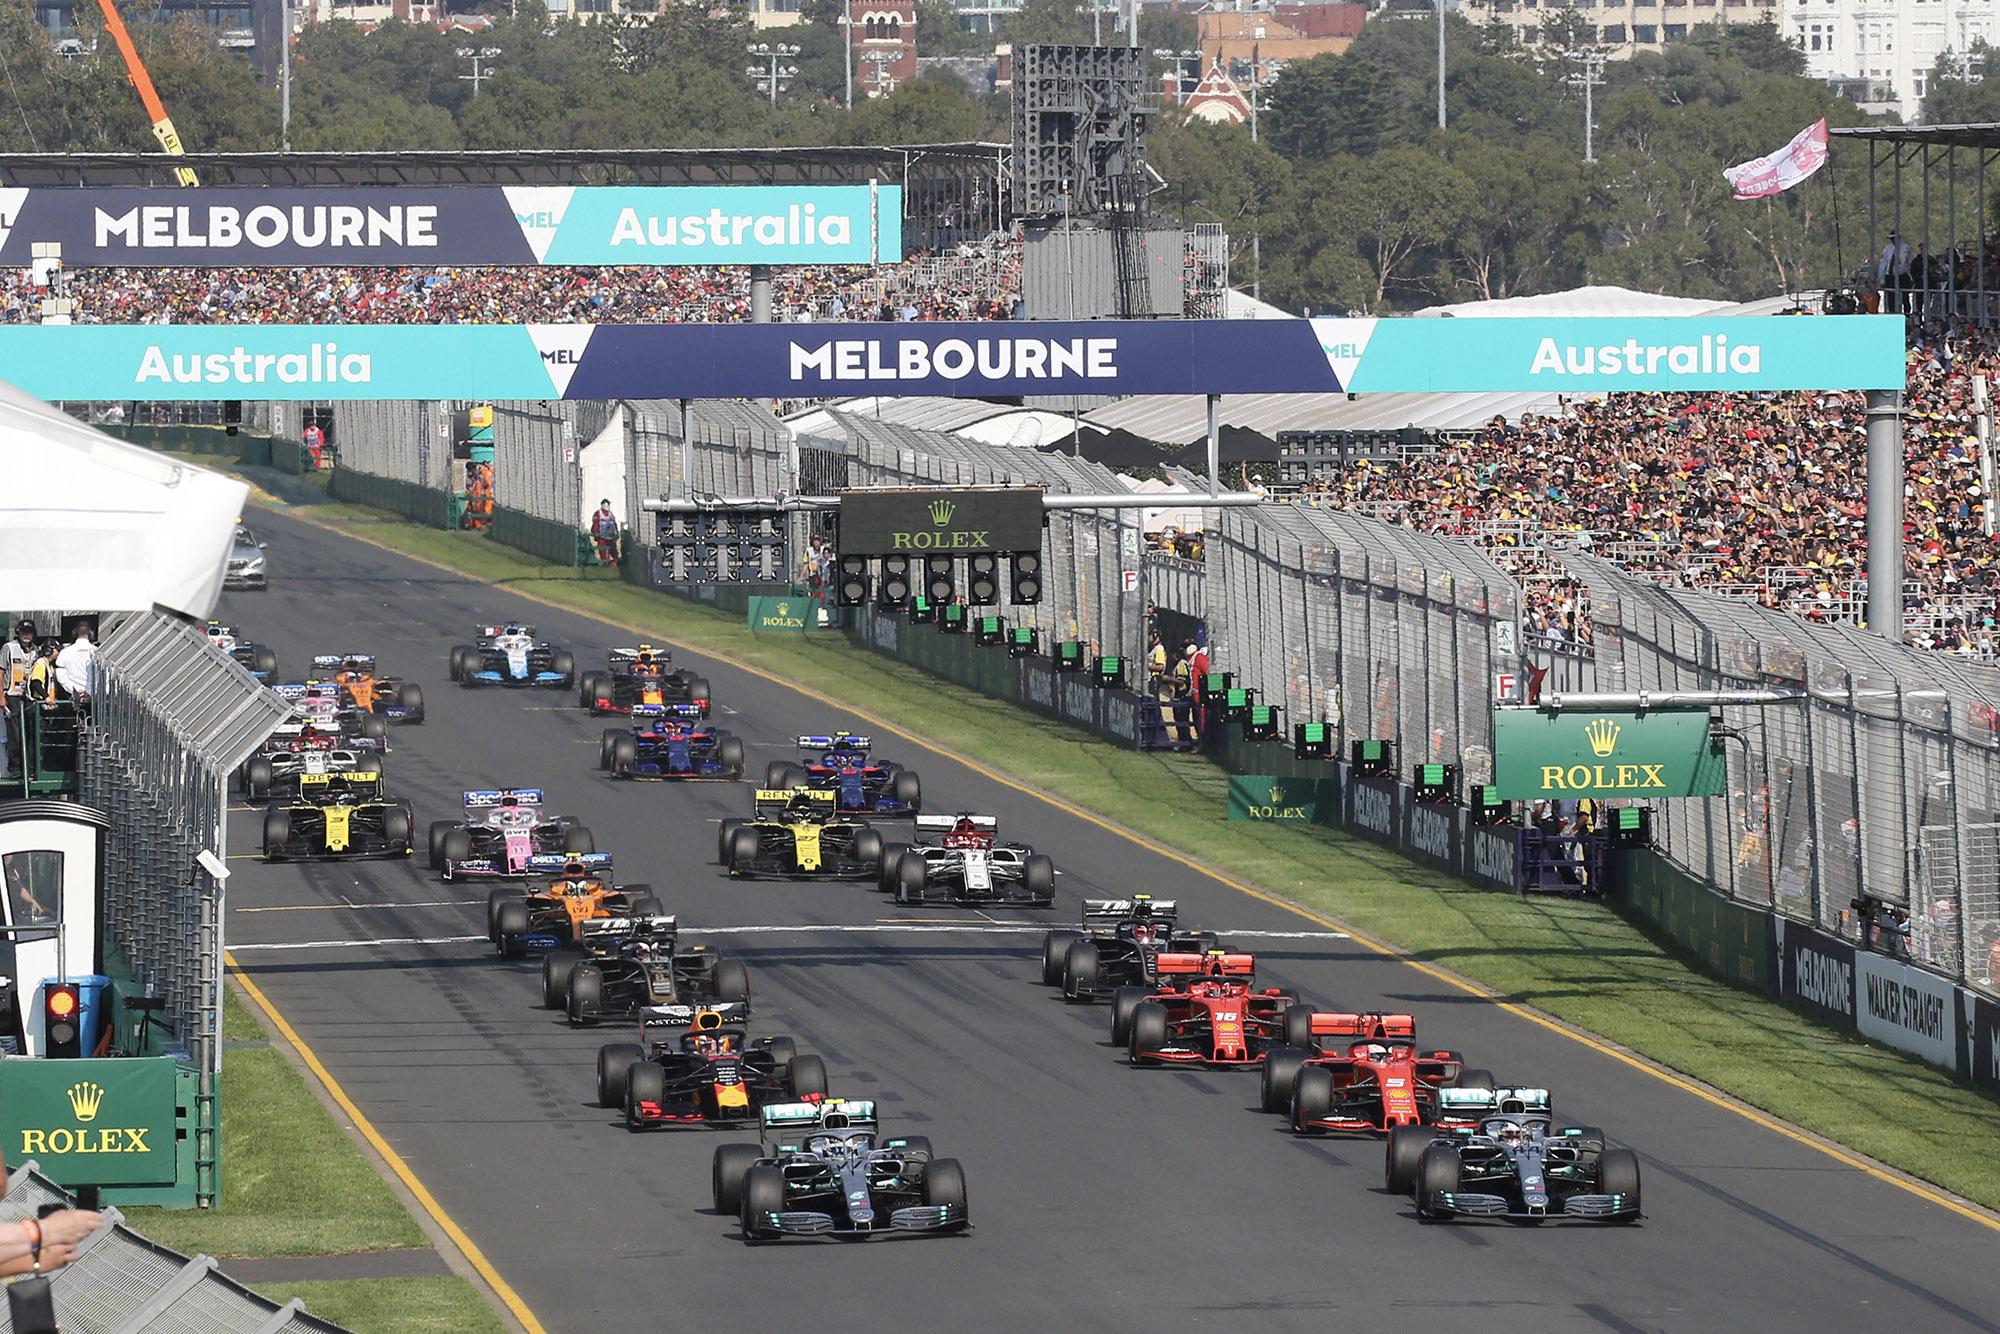 Australian GP start Melbourne 2019